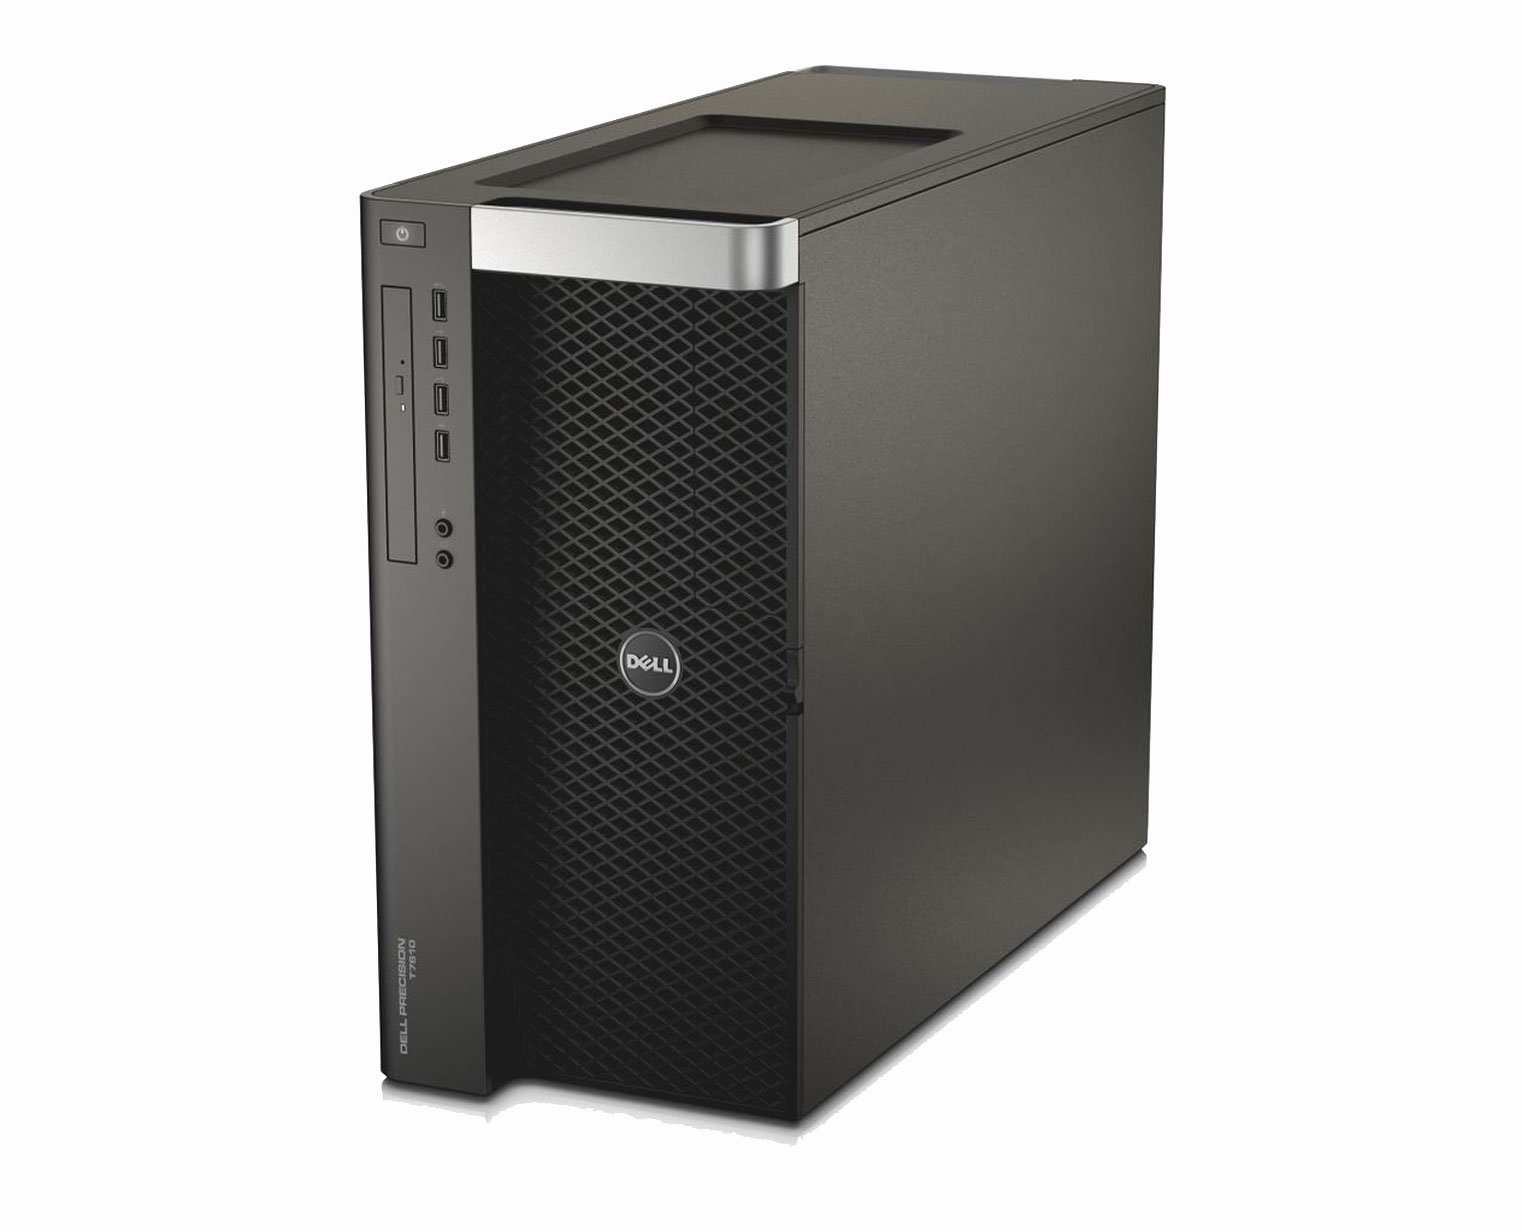 Maximum Performance - Dell Precision Tower 7000 Series